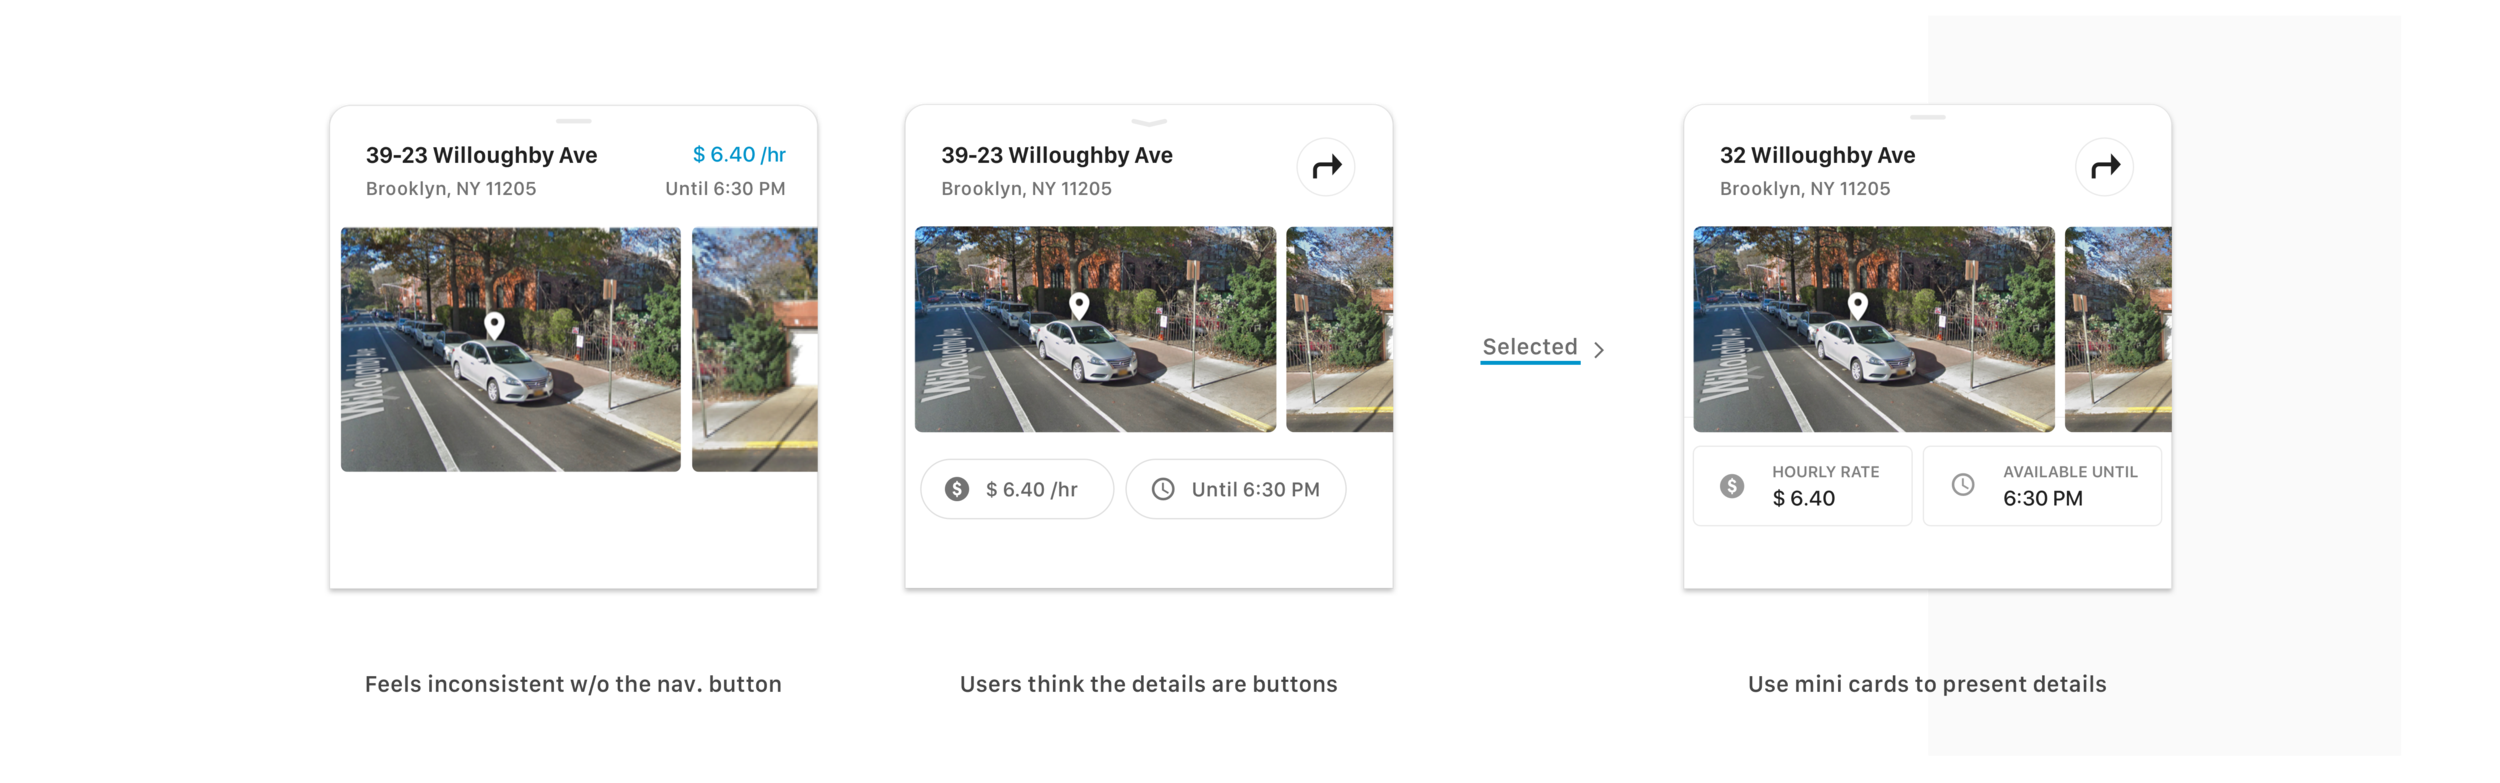 UI View Copy 9.png